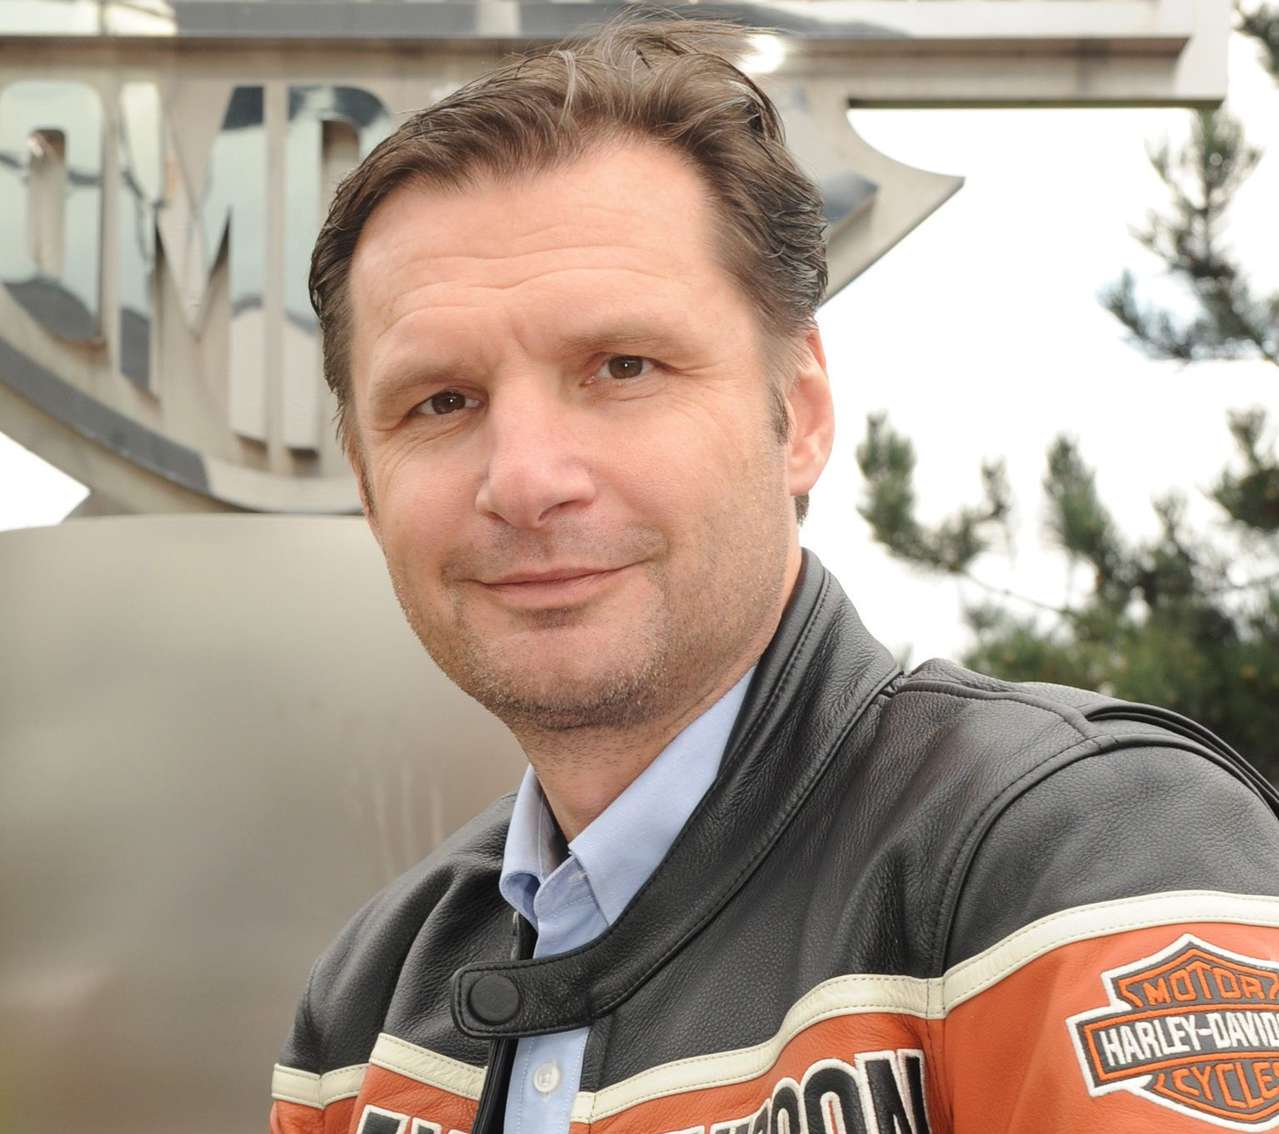 Christian Arnezeder